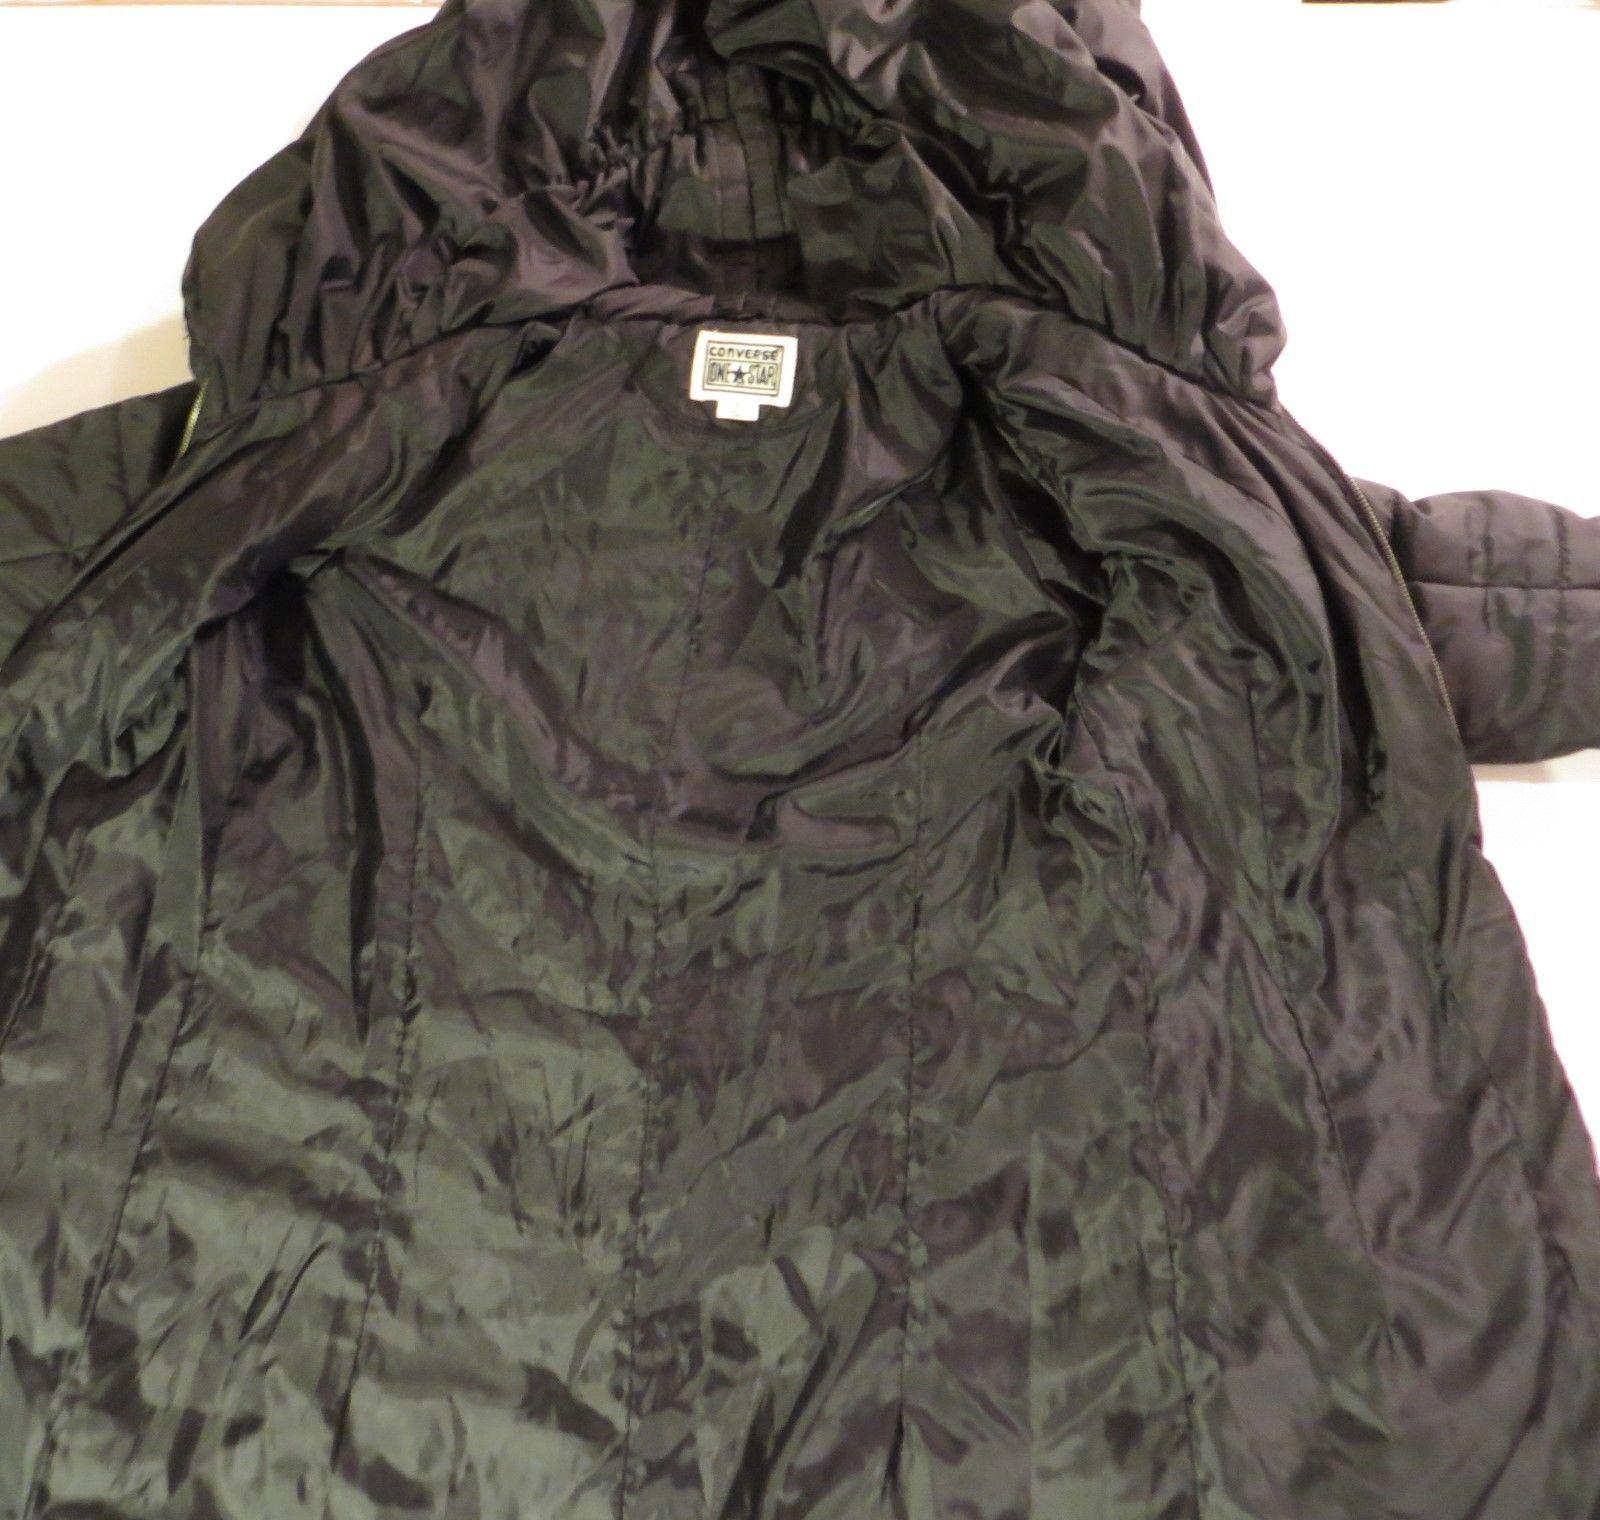 Converse One Star Winter Coat Womens Small Hood Warm Parka Jacket Black 4be9ffcc27df